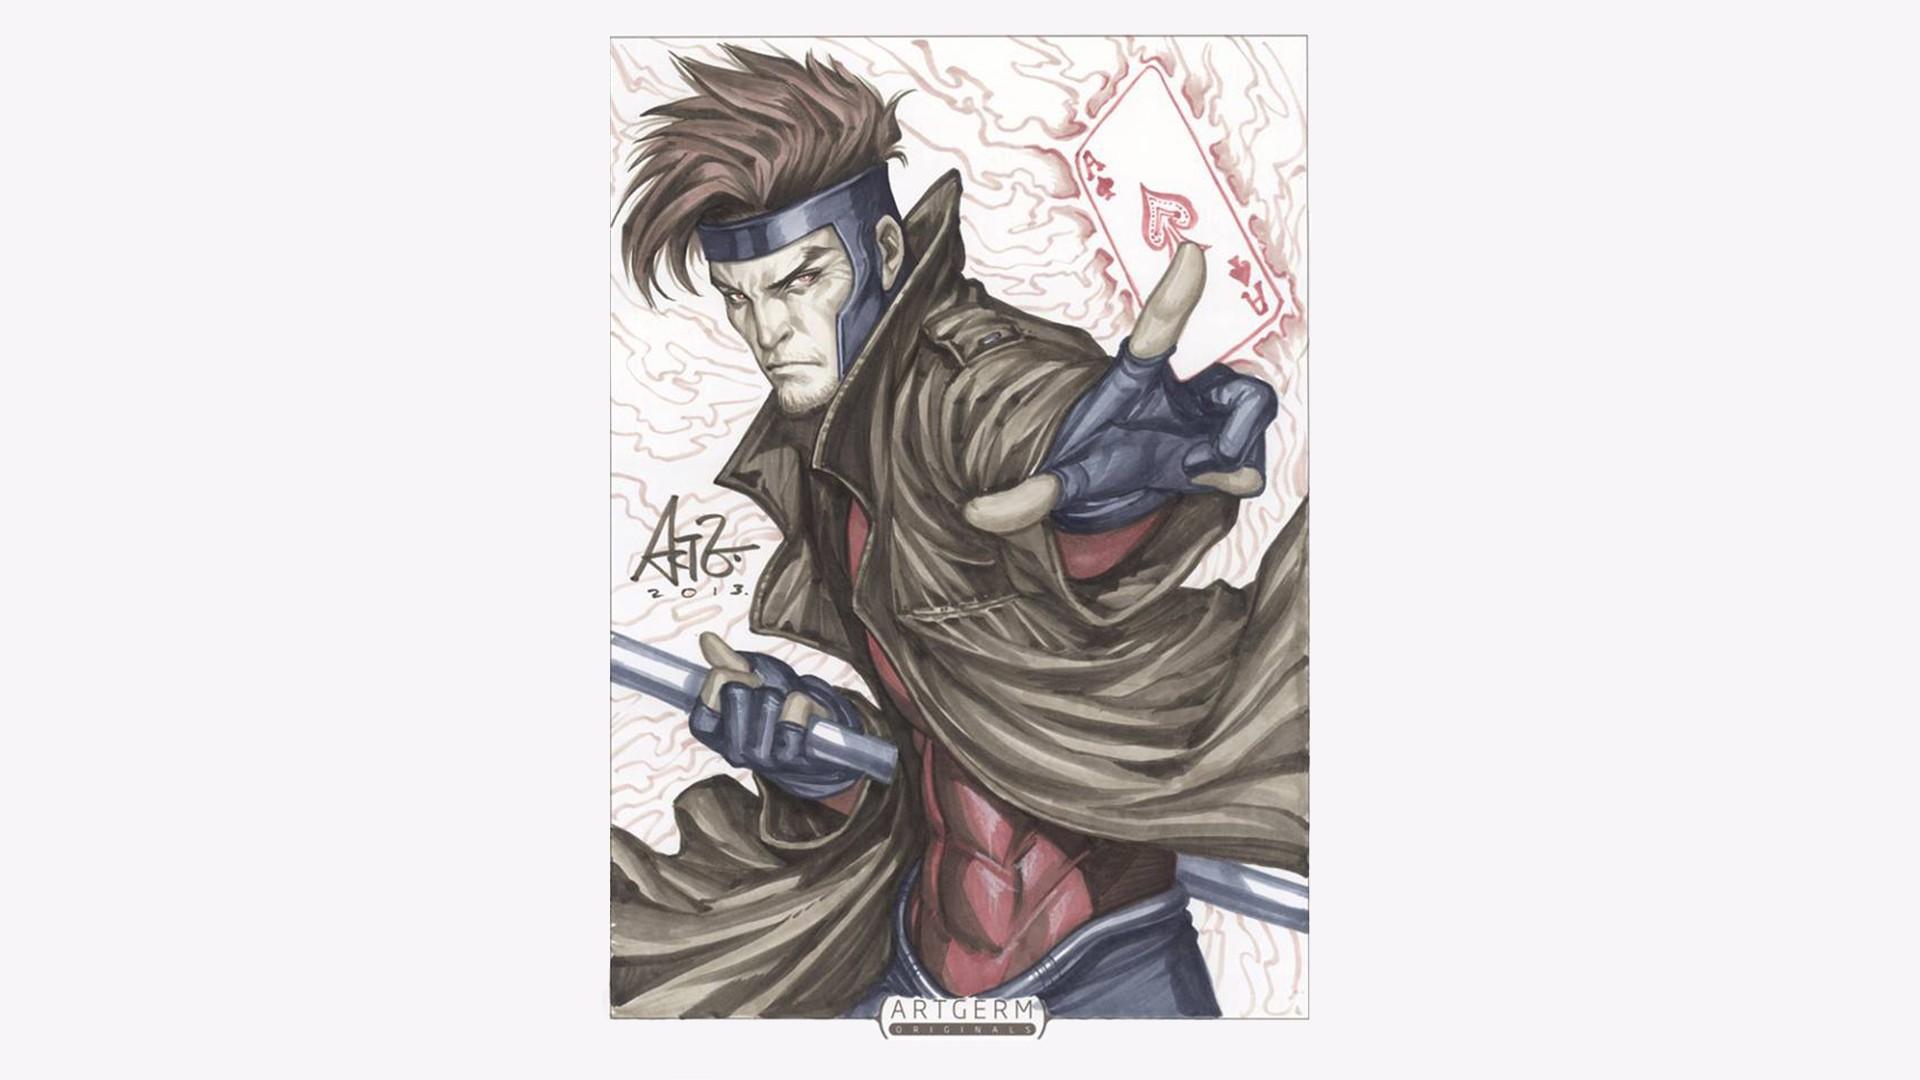 gambit guardians wallpaper 1920x1080 - photo #29